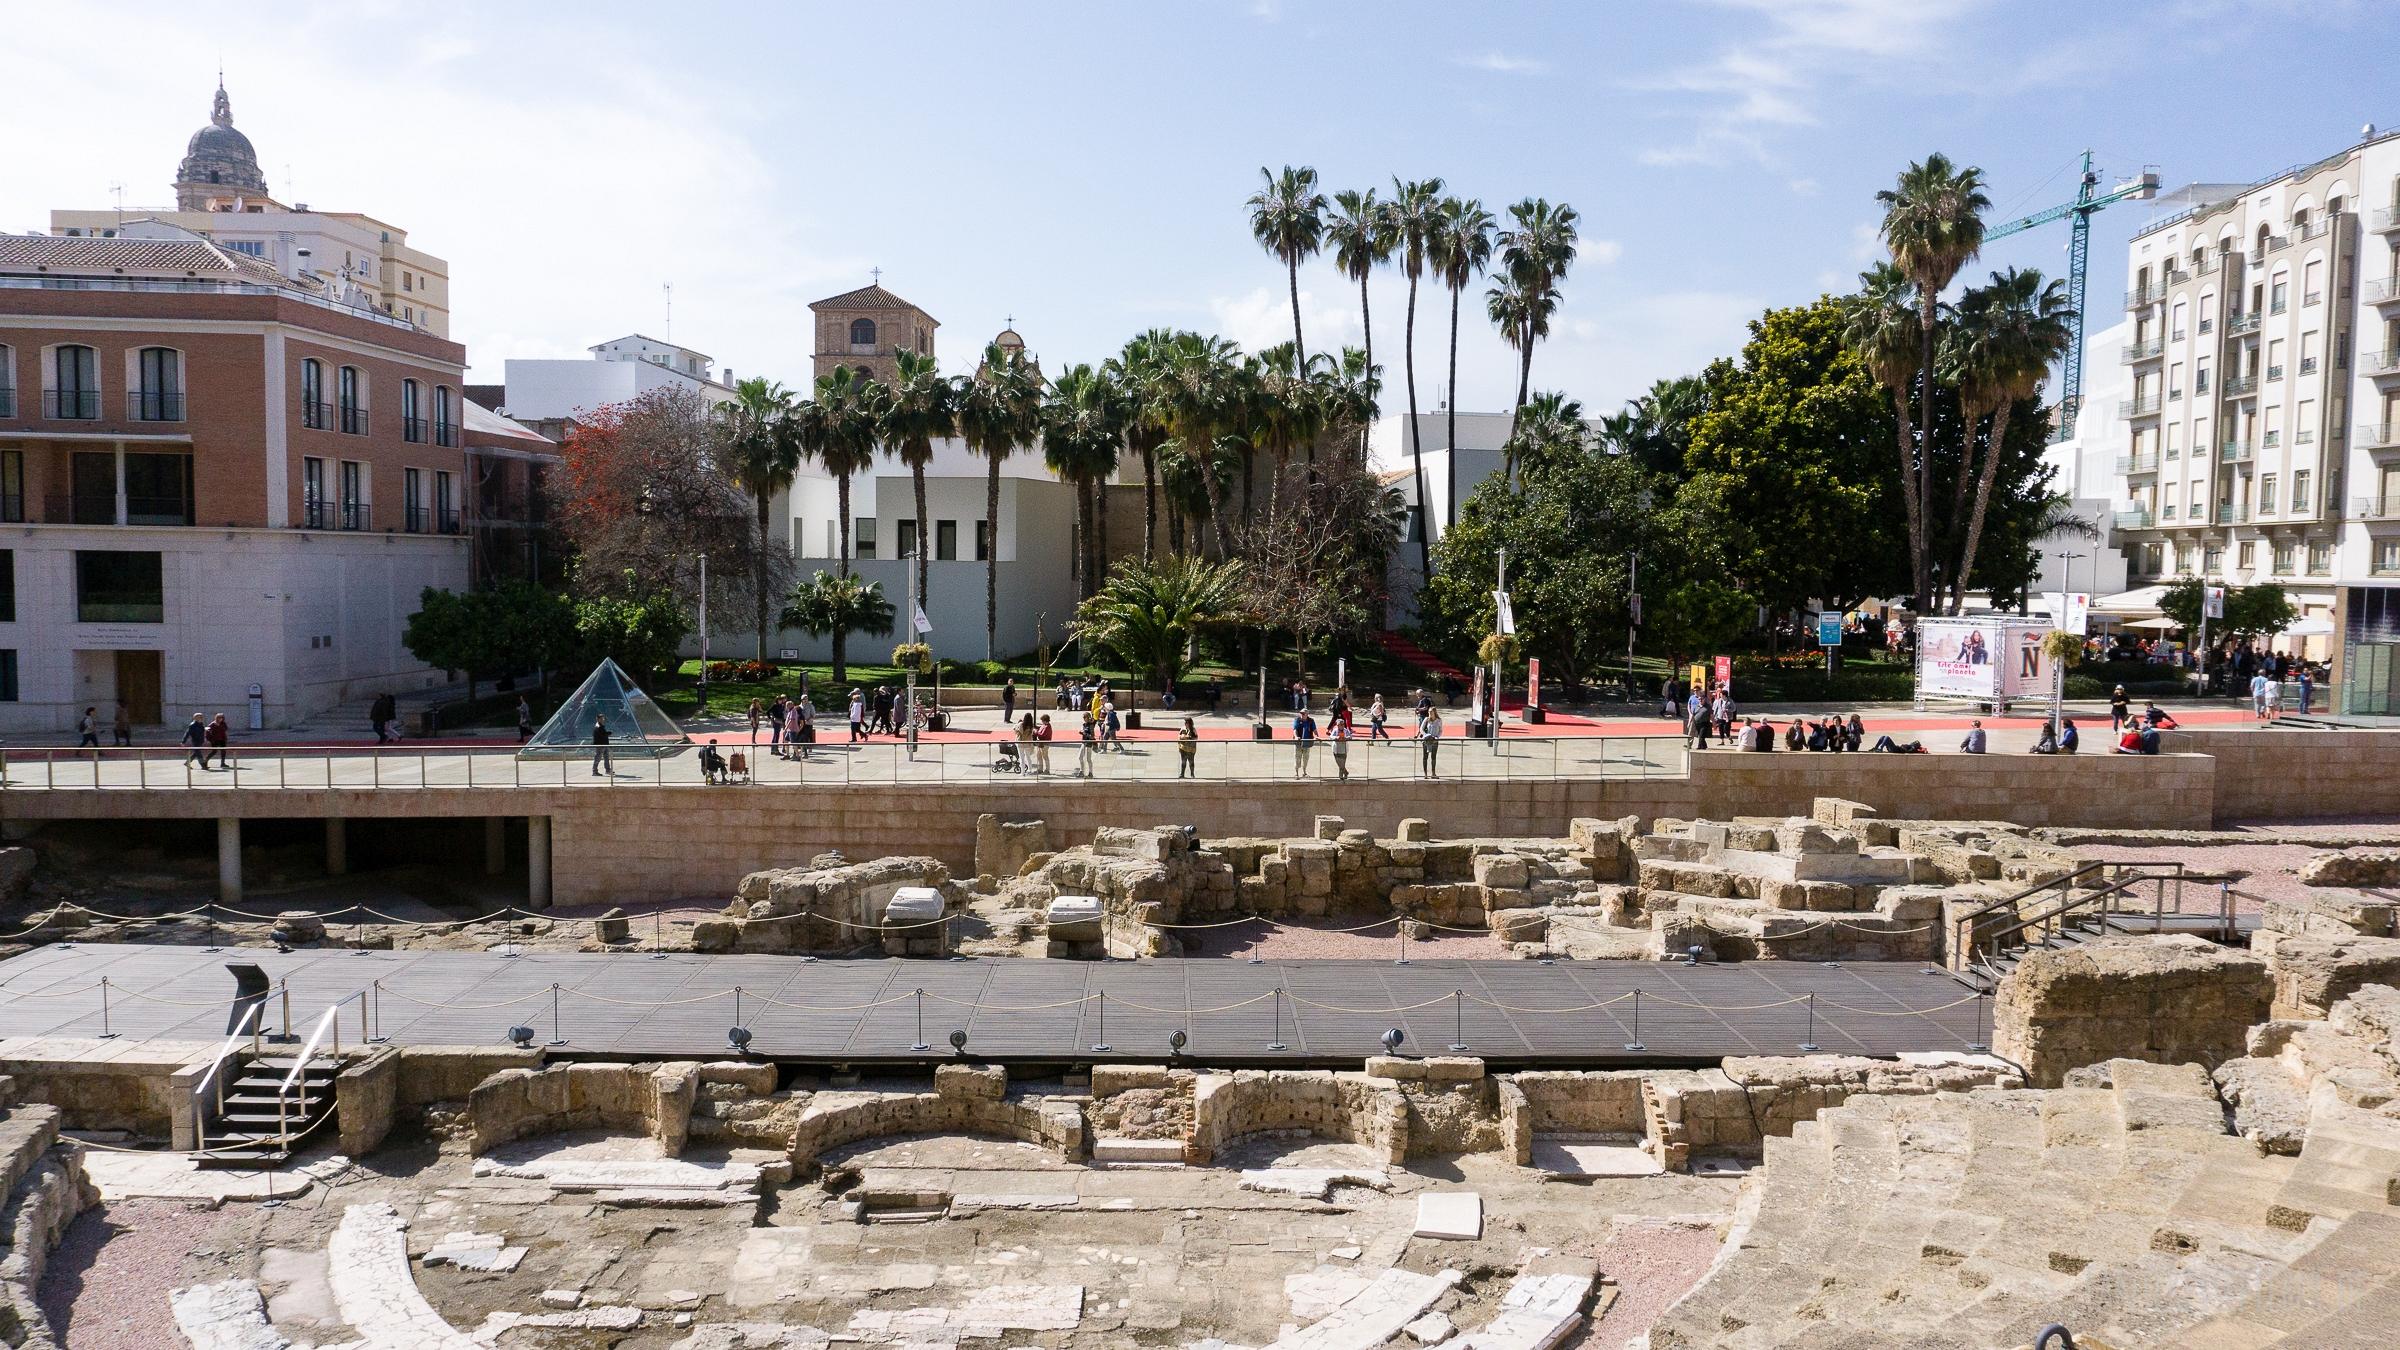 Reisebericht: Malaga in Spanien – mein Tor nach Andalusien – Andalusien Etappe 3